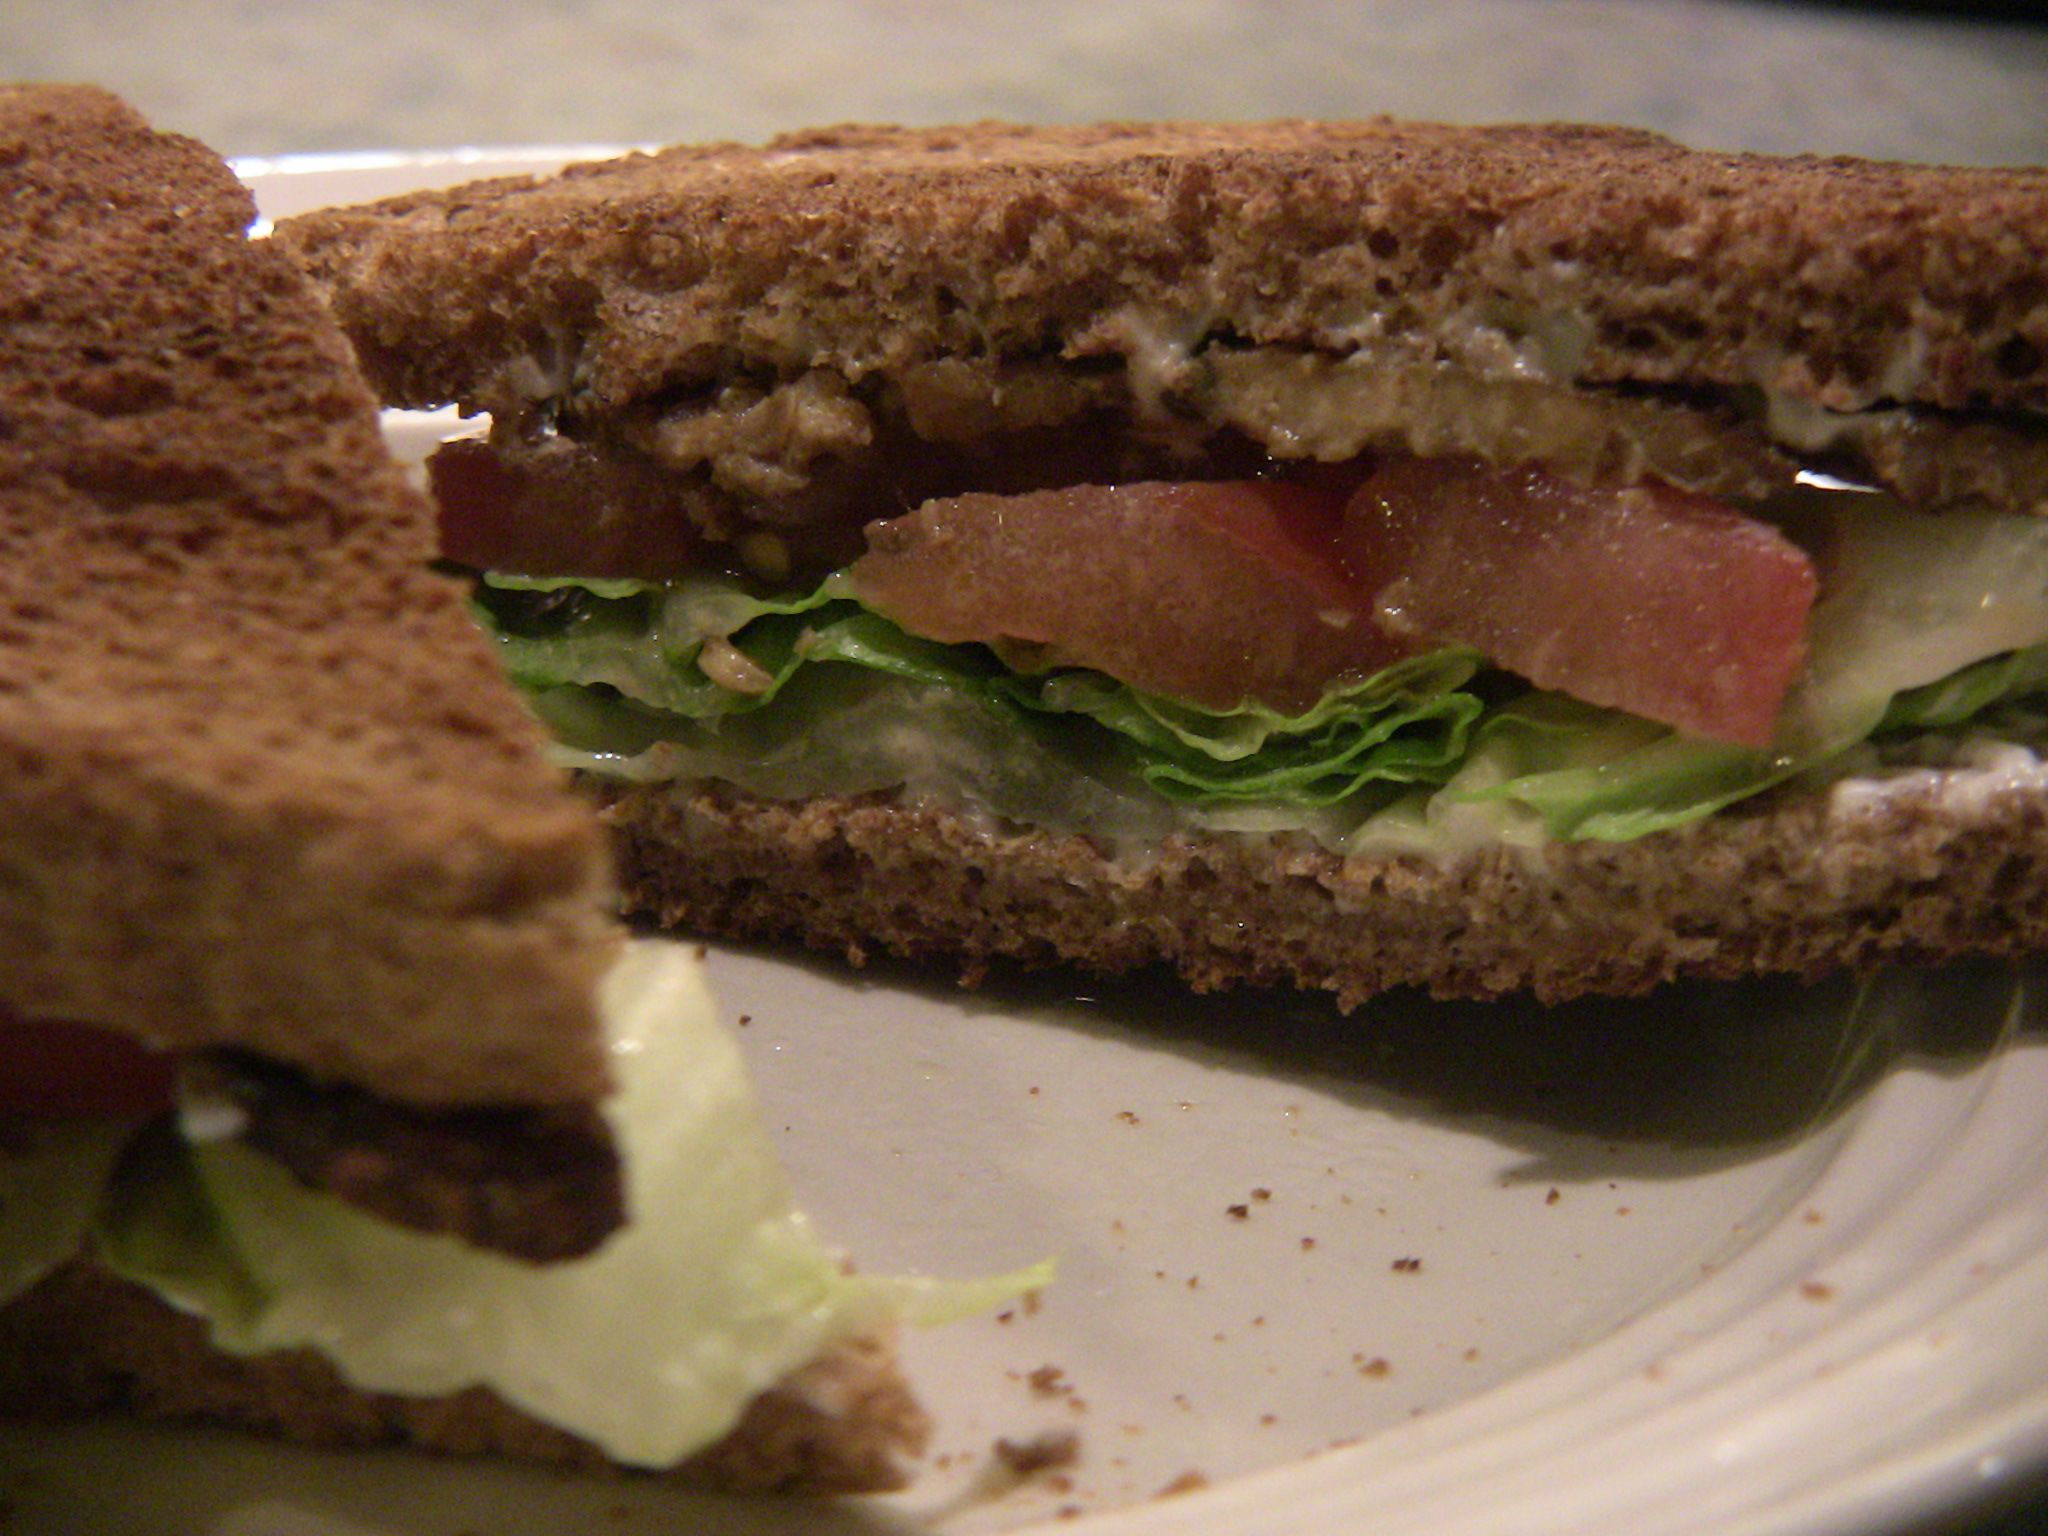 FLT (Facon, Lettuce, Tomatao) is a vegan alternative to an american classic.